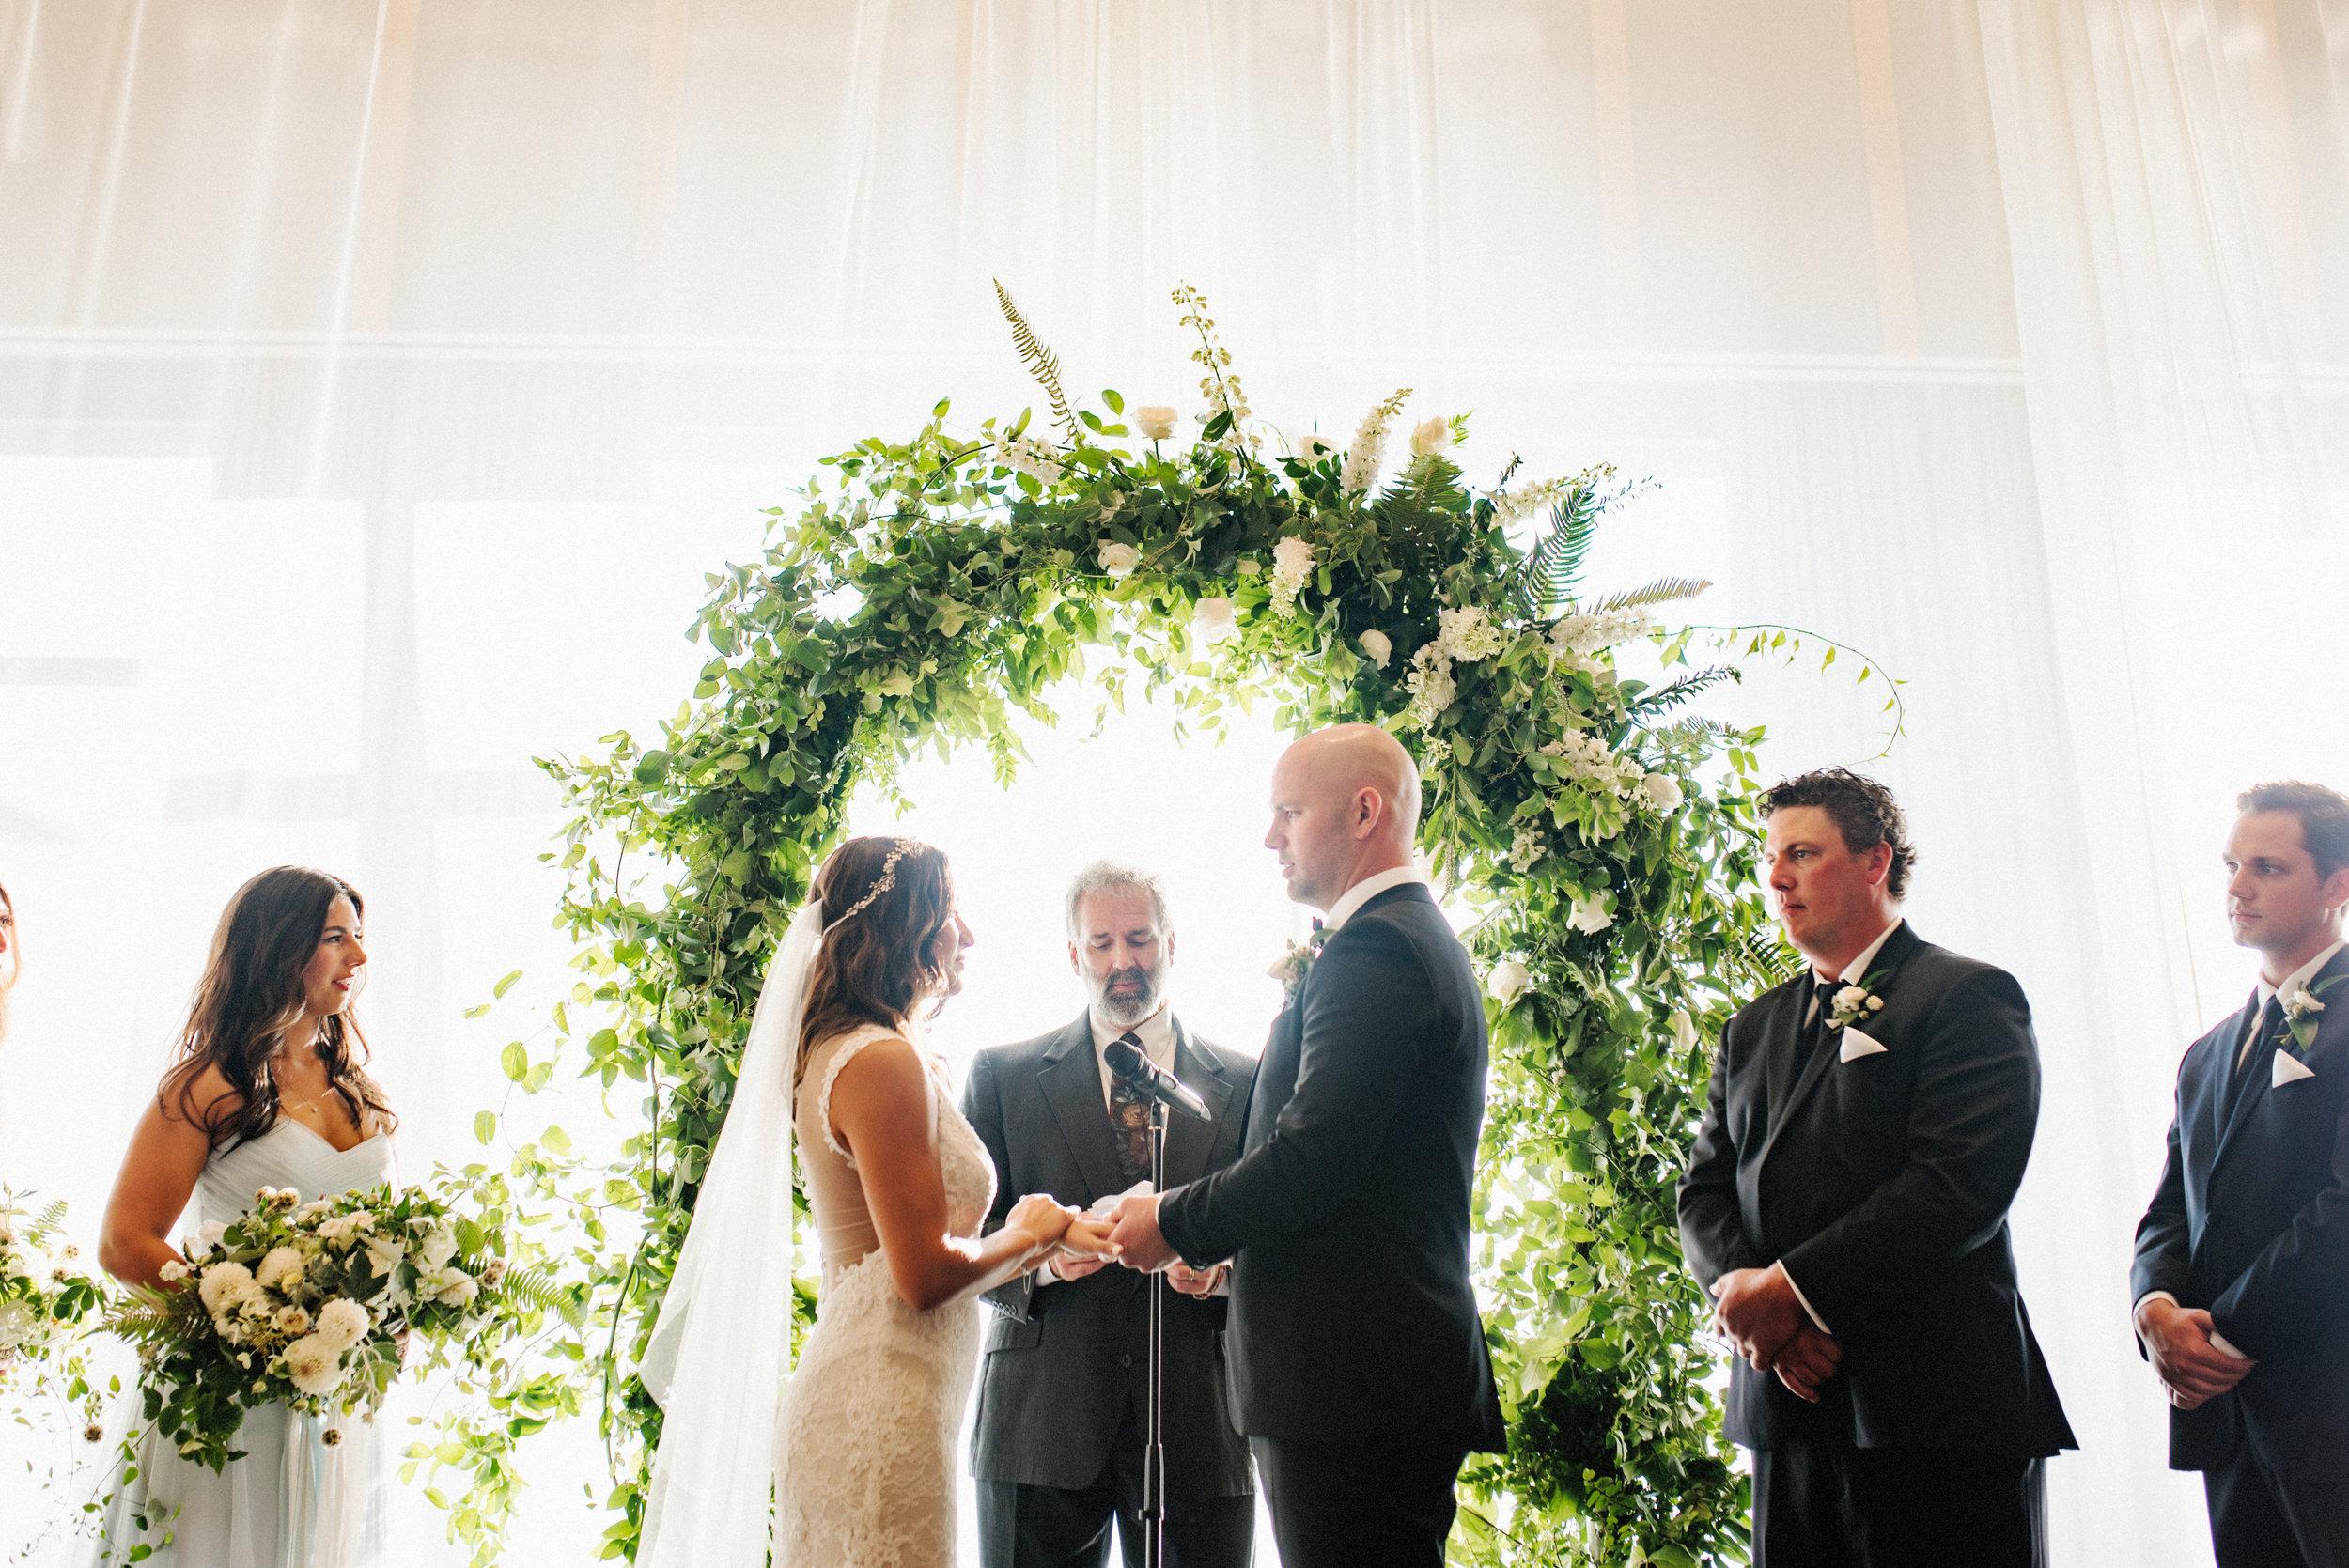 erintommy-four-seasons-seattle-wedding-ryan-flynn-photography-ceremony-0134.JPG